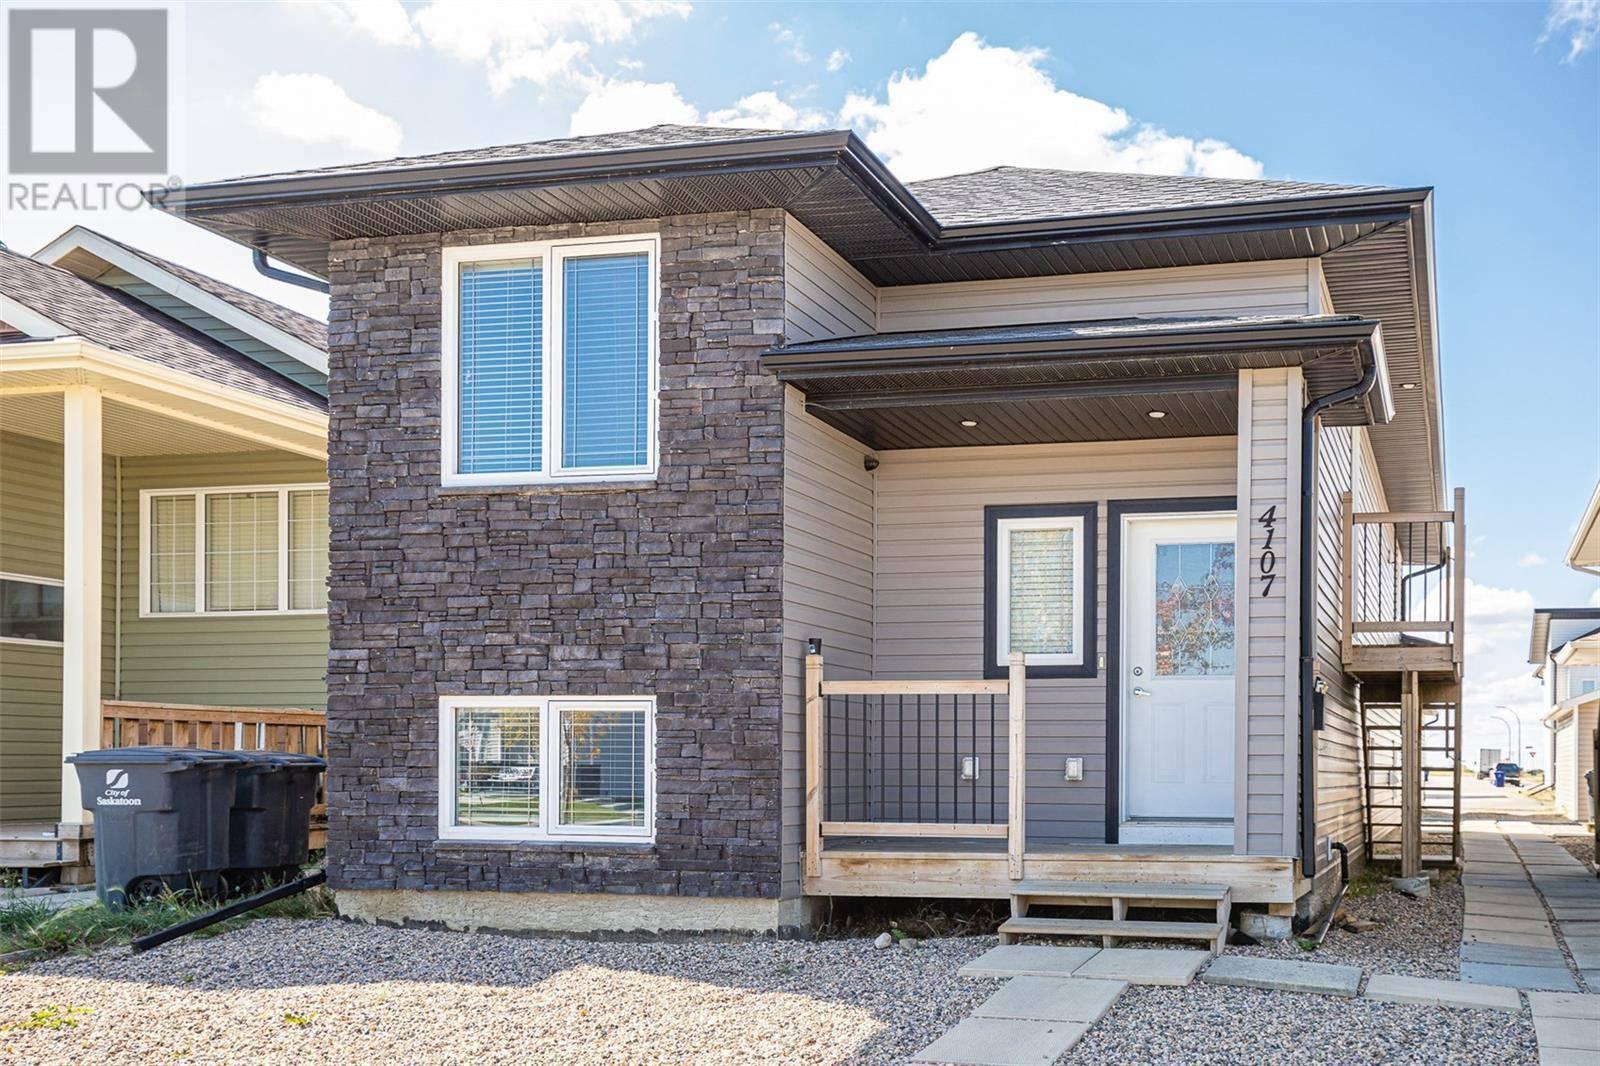 House for sale at 4107 33rd St W Saskatoon Saskatchewan - MLS: SK786990